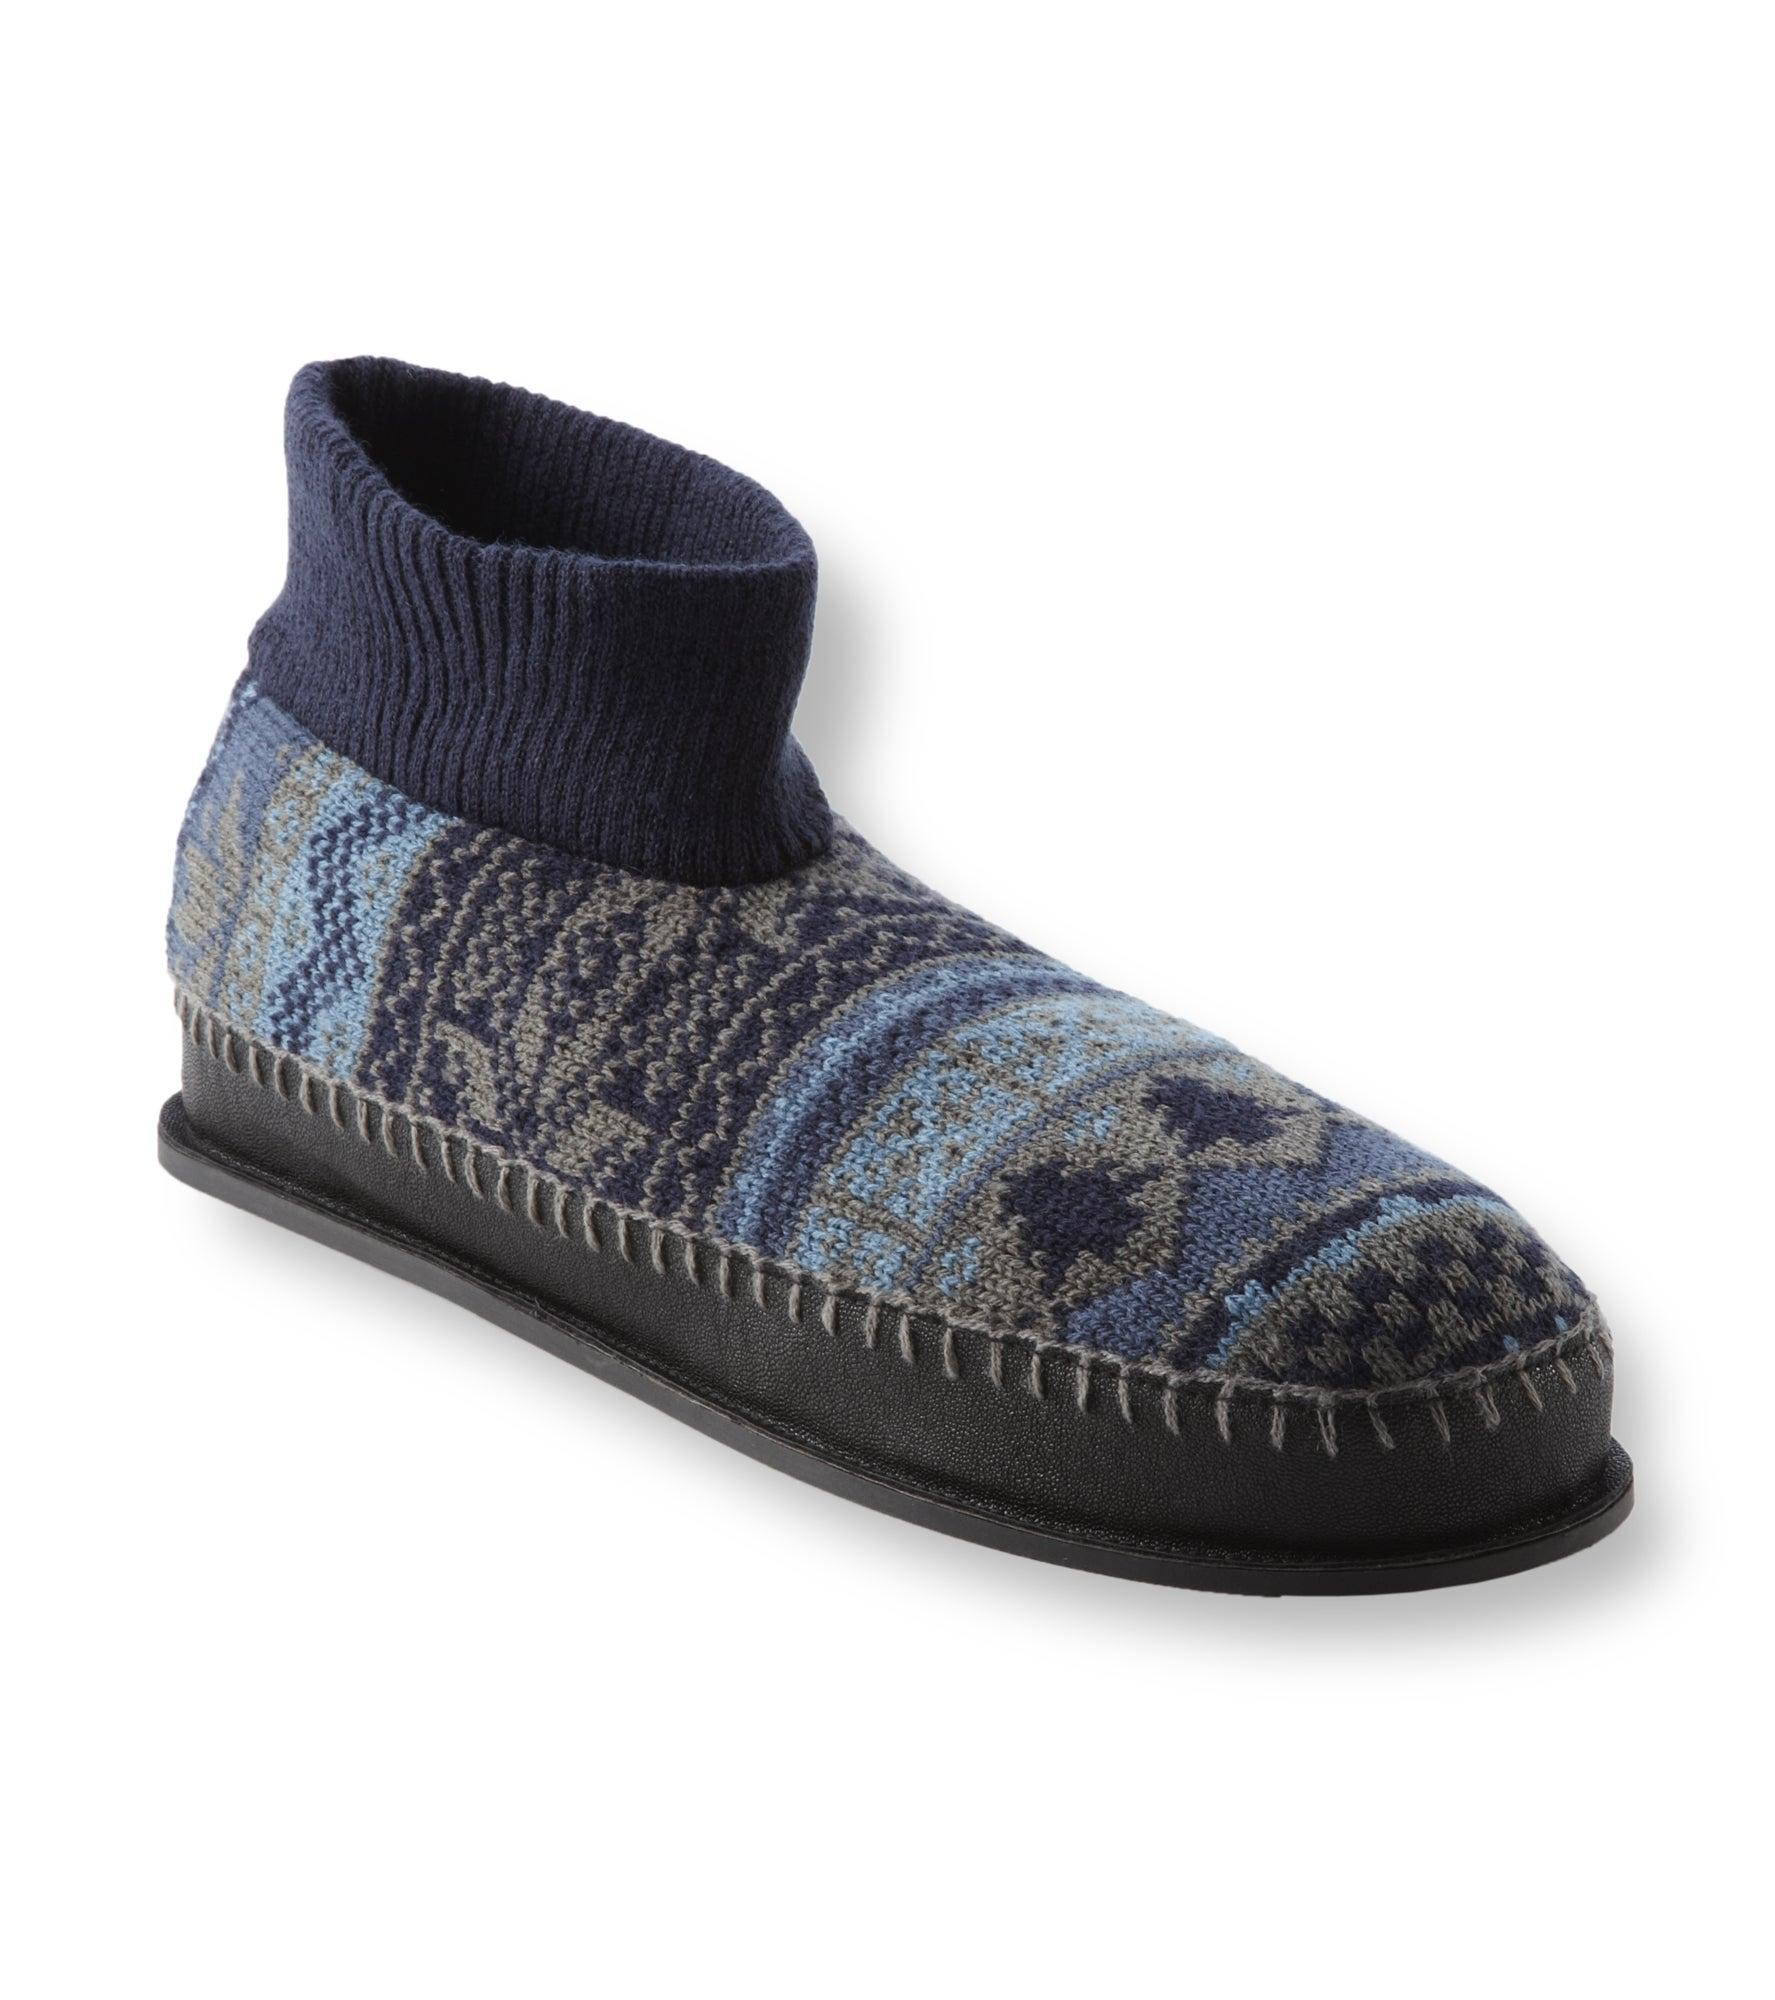 Muk Luks Men's 'Cullen' Blue Nordic Knit Ankle Slippers